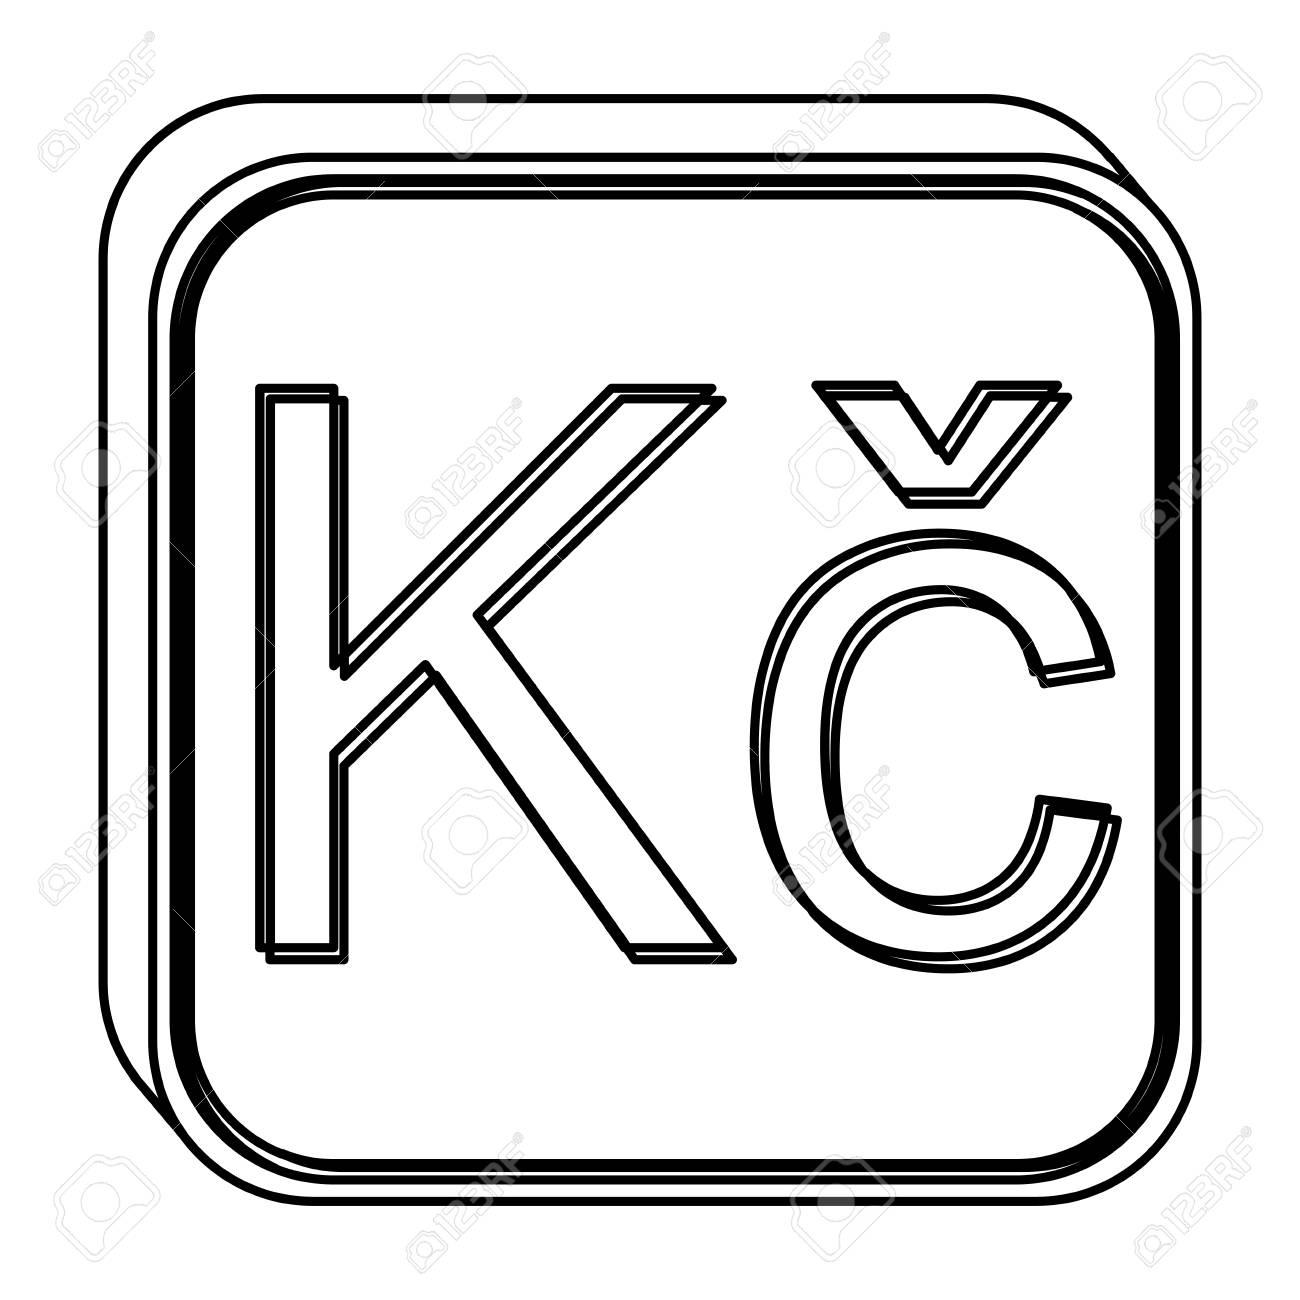 Monochrome Square Contour With Currency Symbol Of Czech Koruna